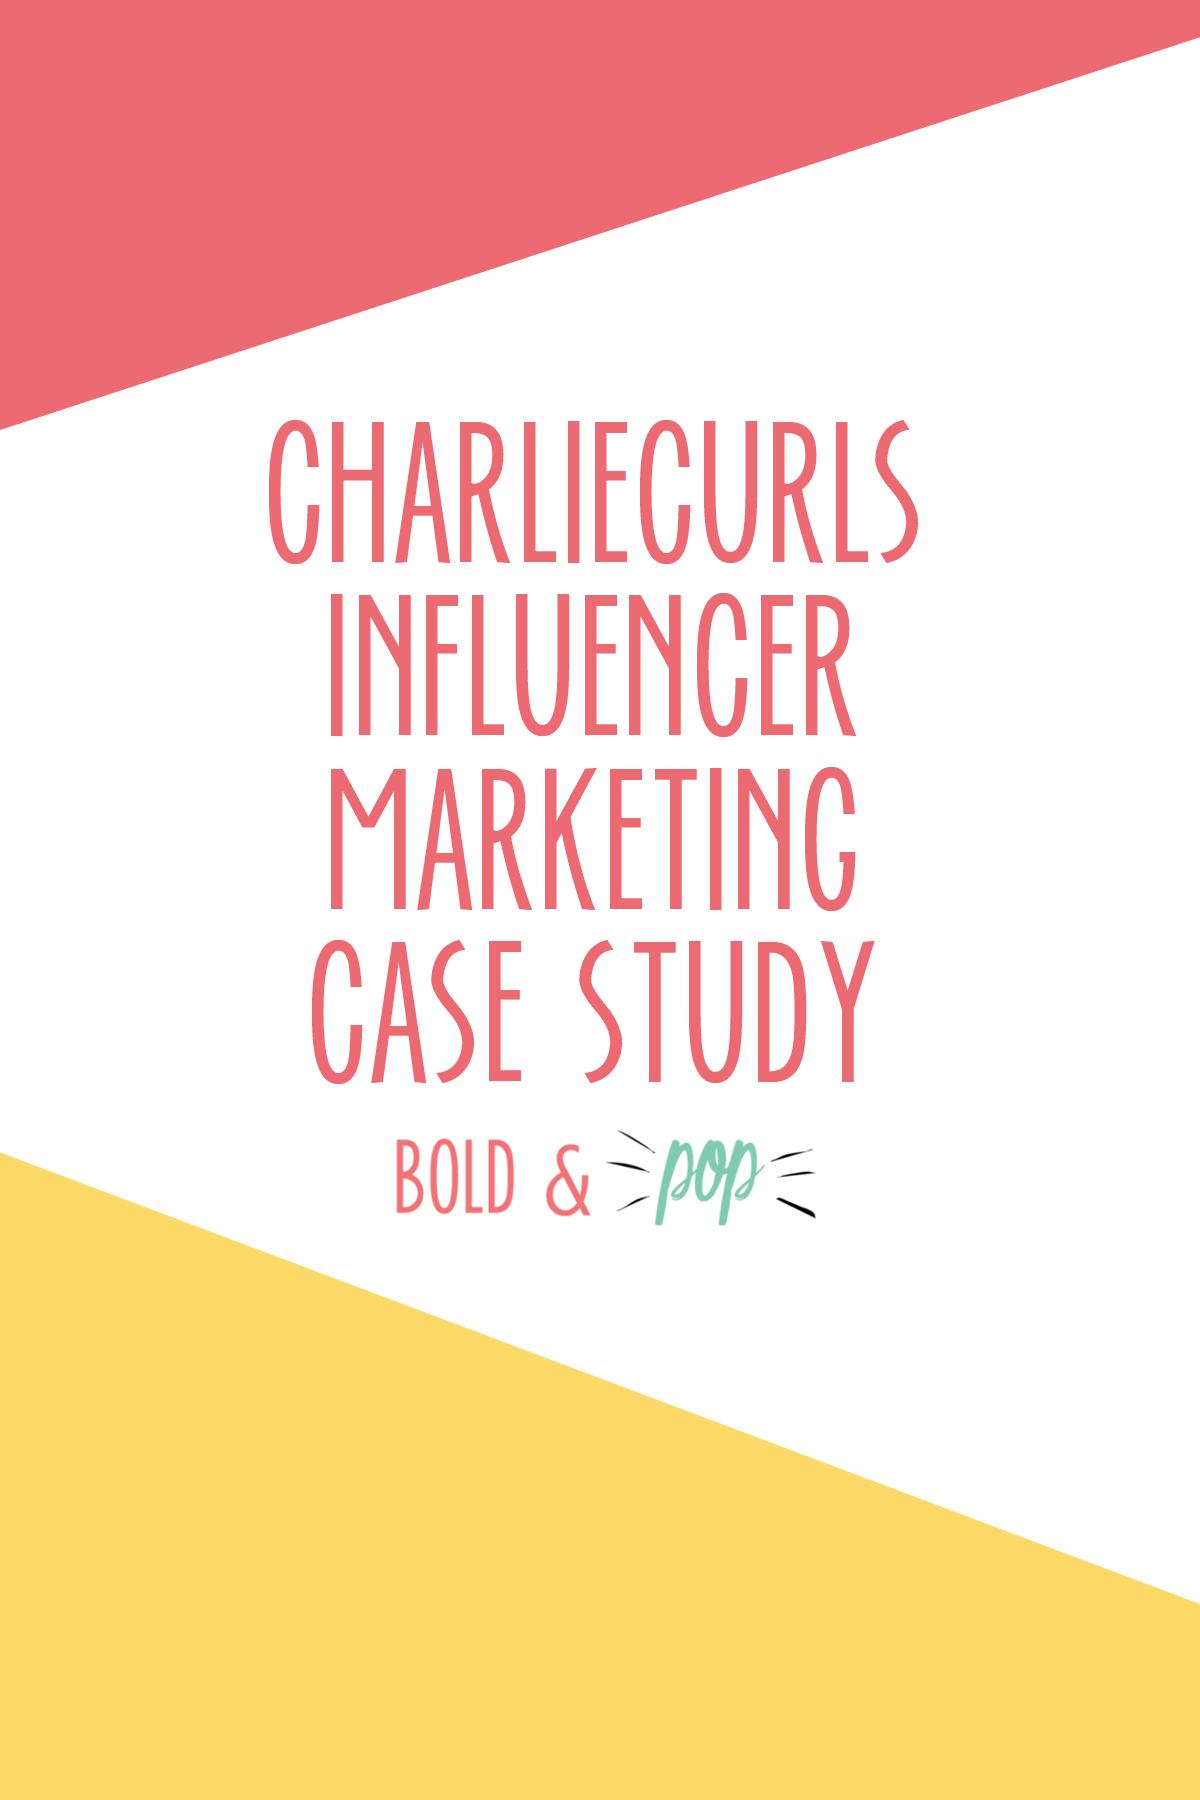 Charliecurls Influencer Marketing Case Study Bold Pop Social